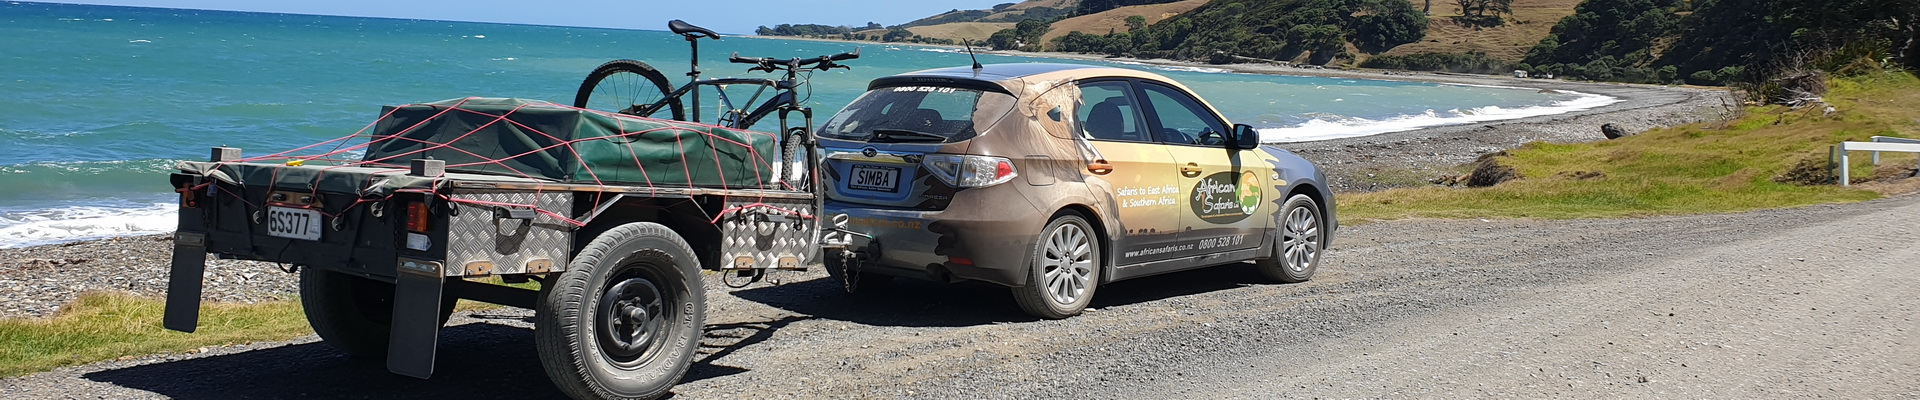 Simba and KiwiFlyer on the road to Fletchers Bay, Coromandel Peninsula